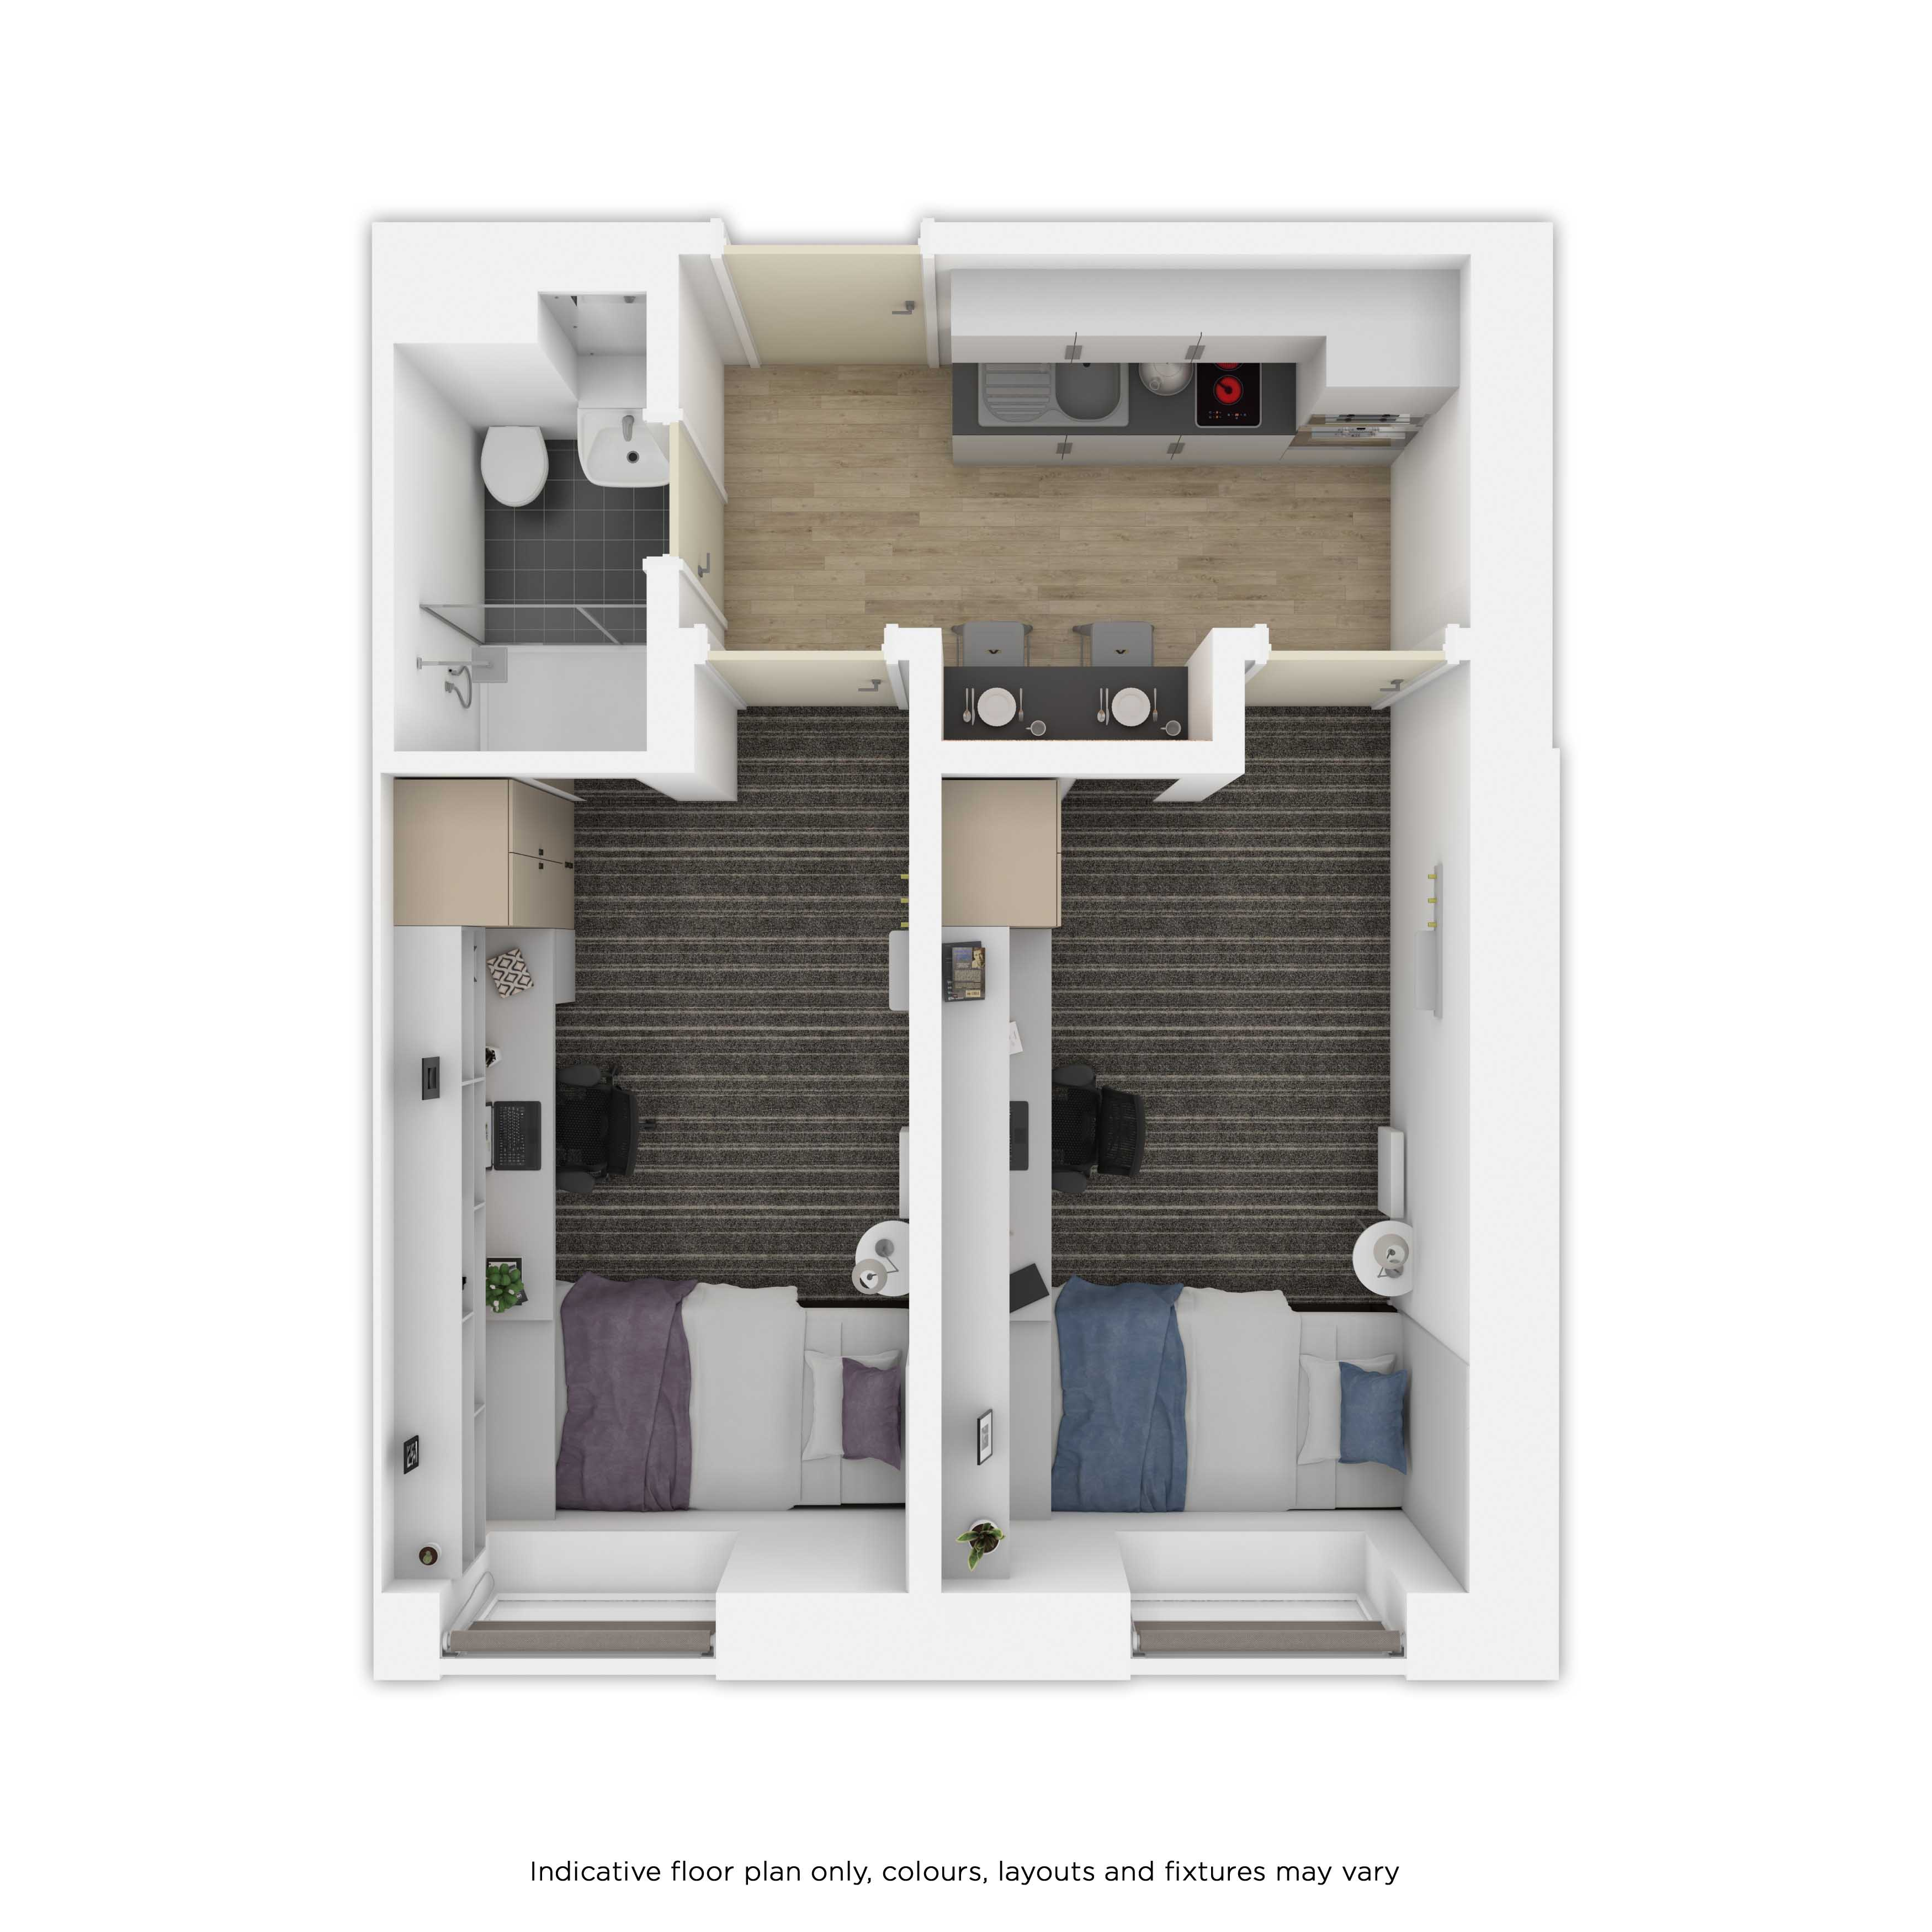 Indicative 2DIO floor plan